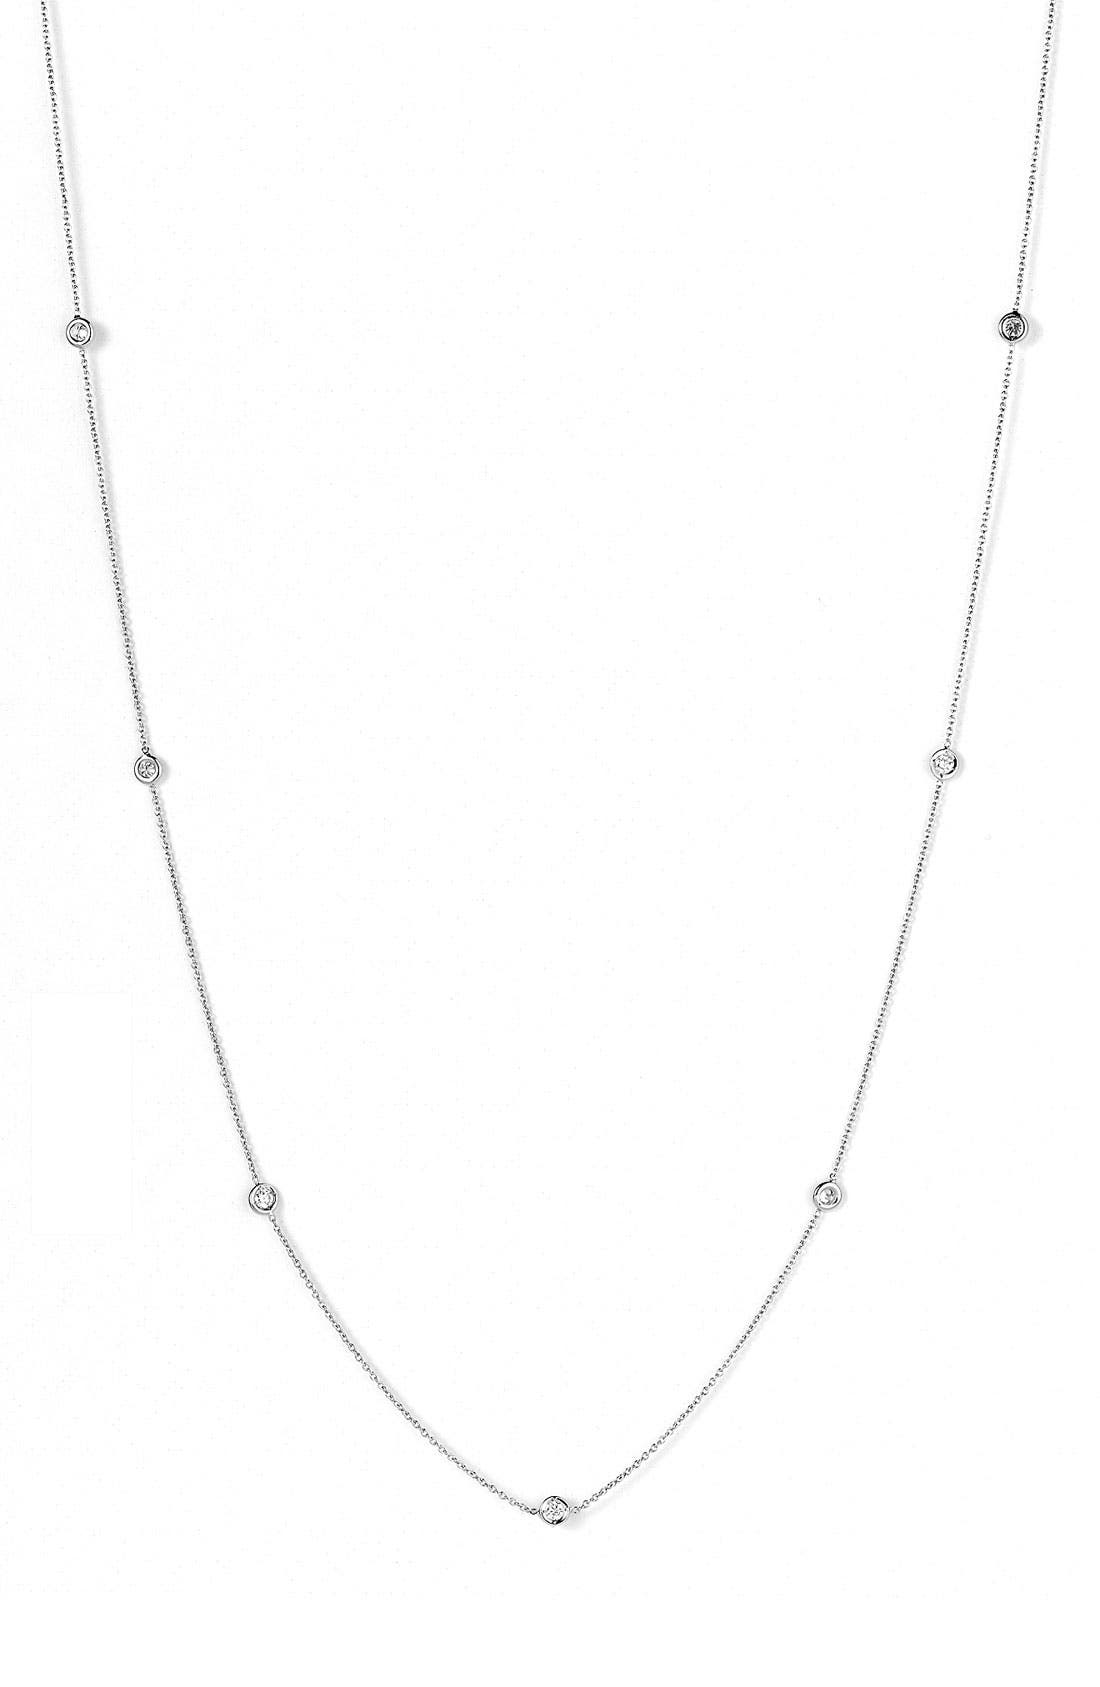 Diamond Station Necklace,                             Alternate thumbnail 2, color,                             White Gold